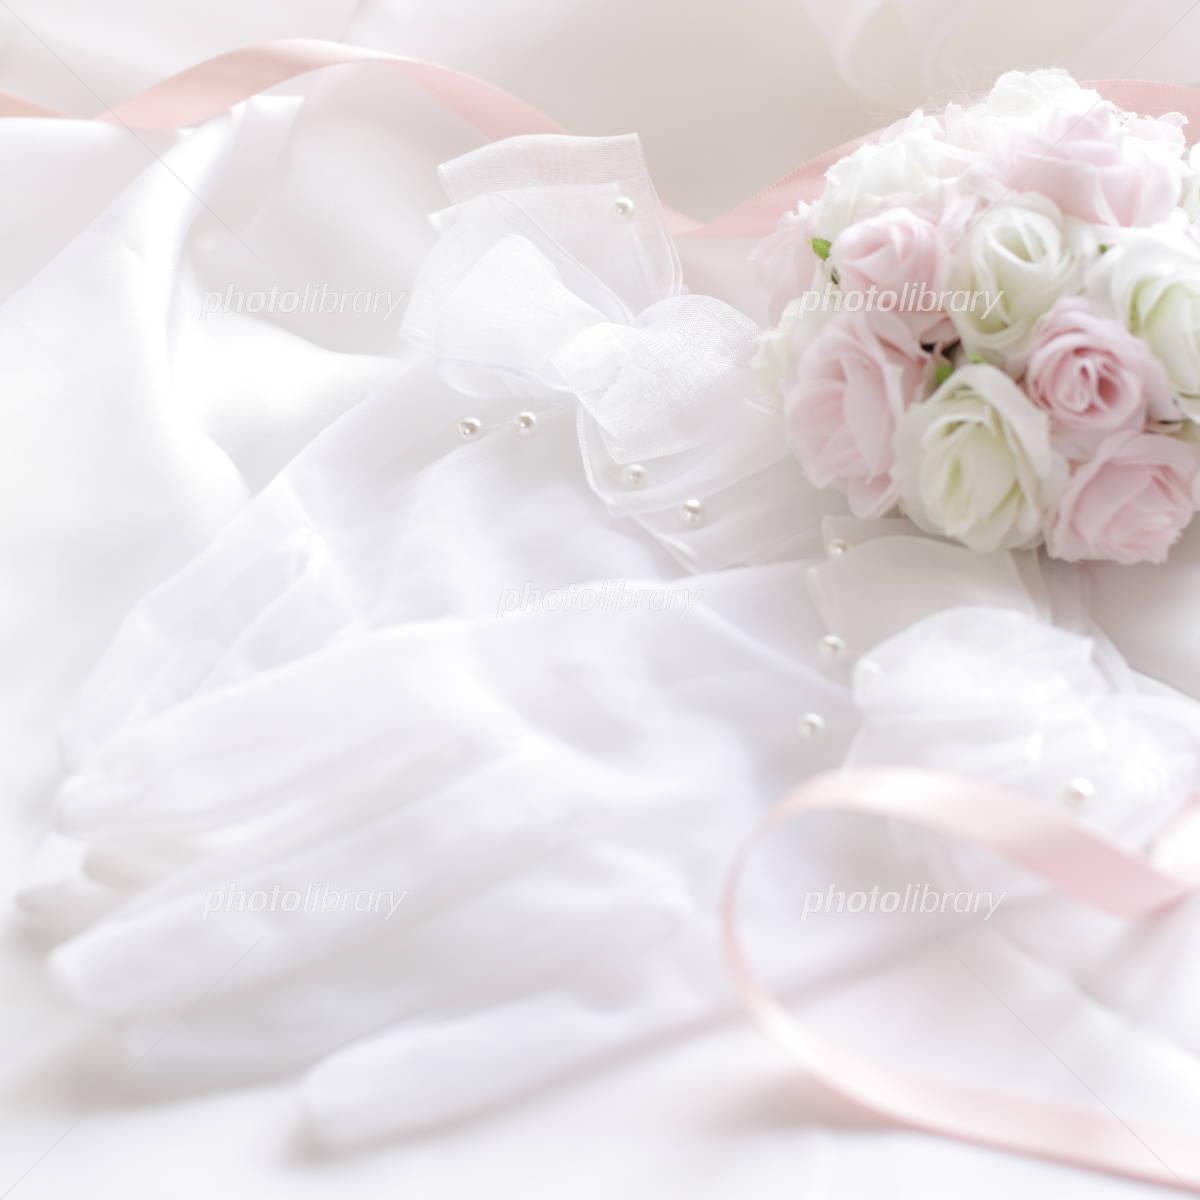 Globe and bouquet of wedding image Photo